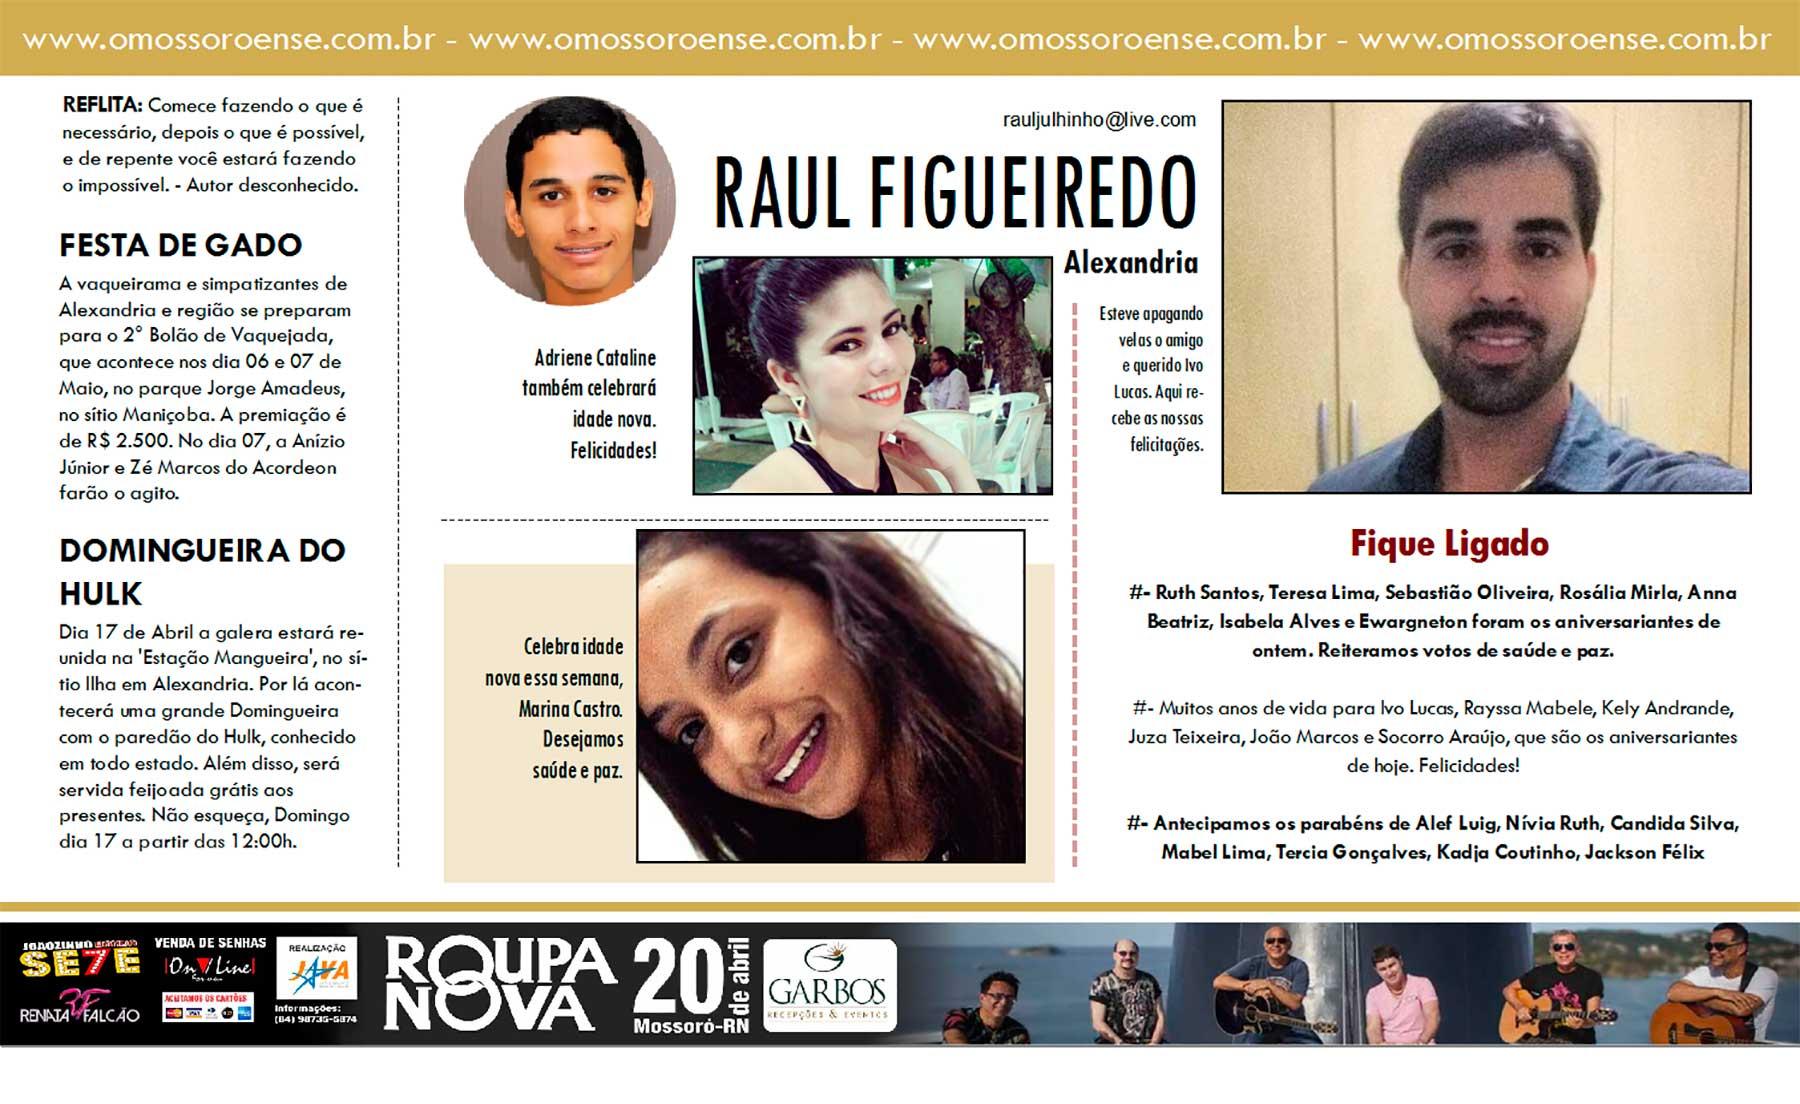 RAUL-FIGUEIREDO---13-04-2016